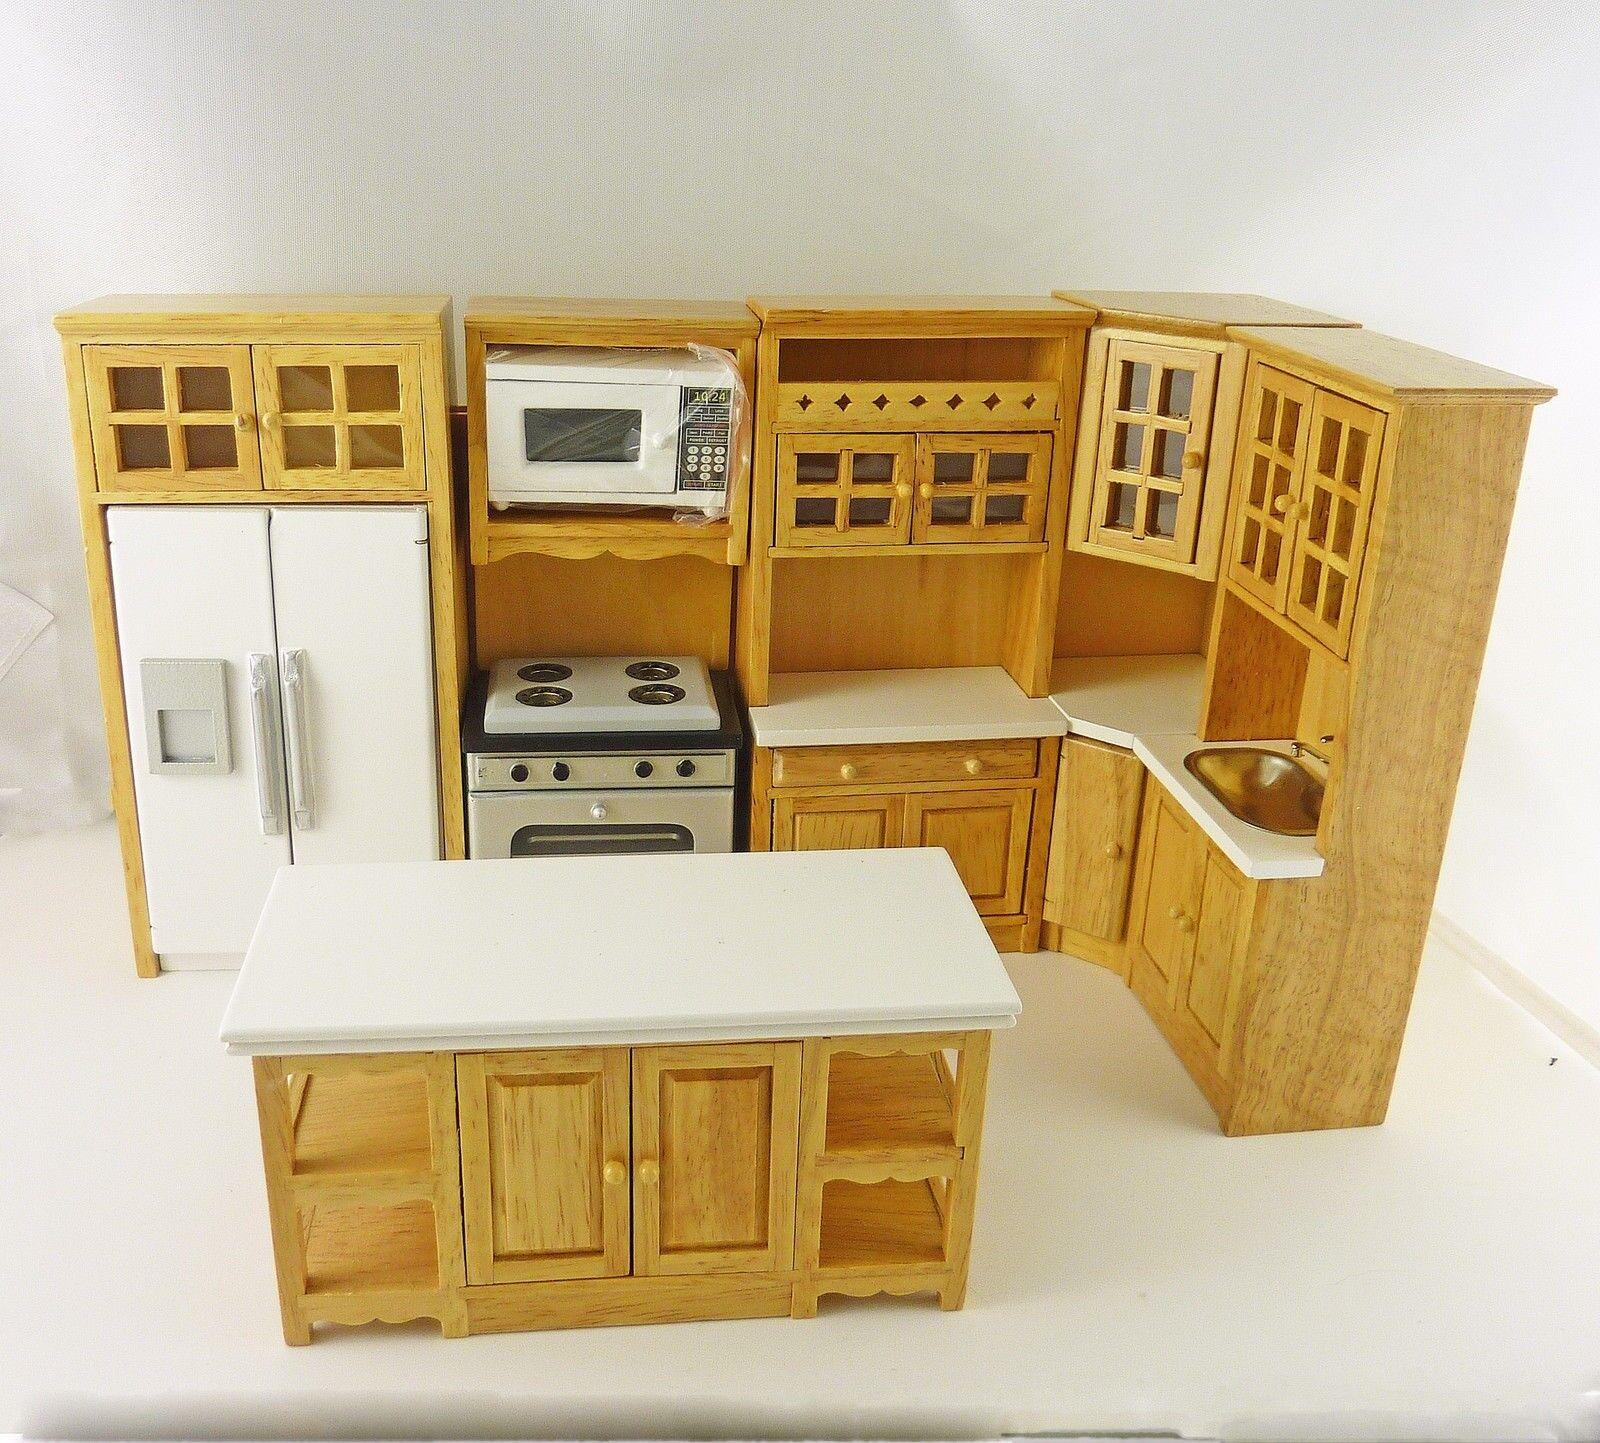 Brackets wooden 1//12 scale dollhouse miniature furniture CLA70261  4pack